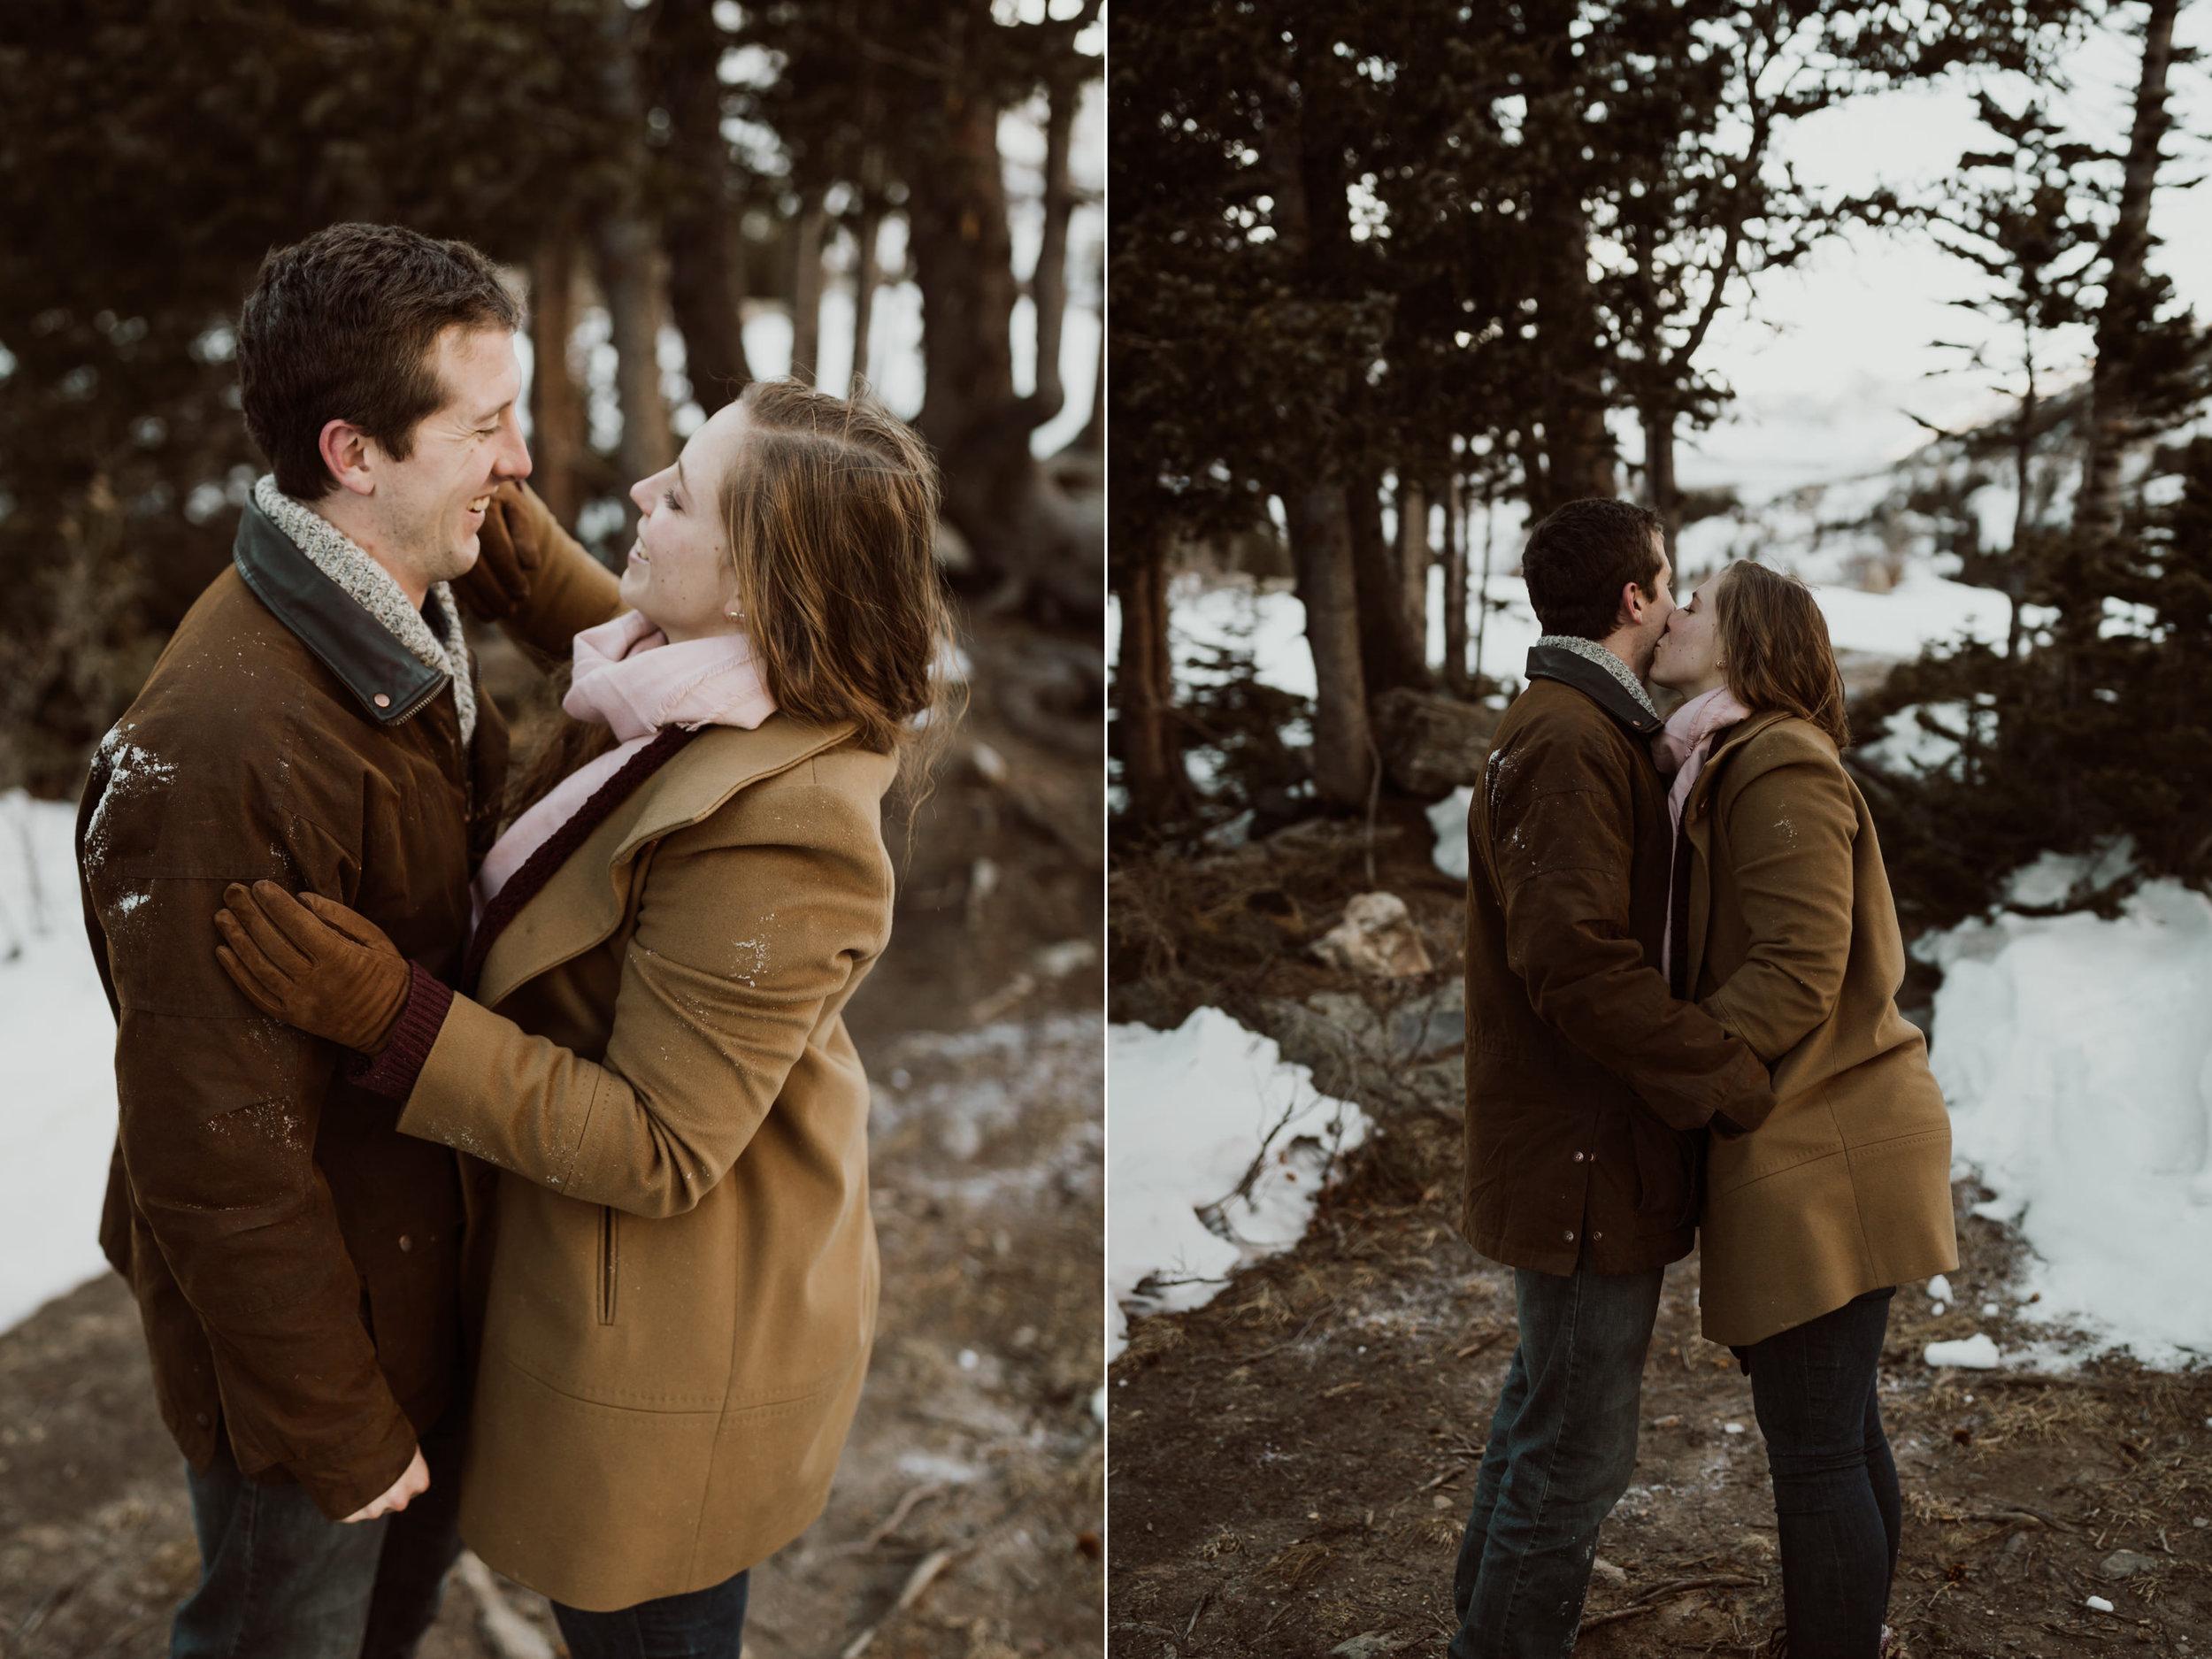 Breckenridge-wedding-photographer-55.jpg